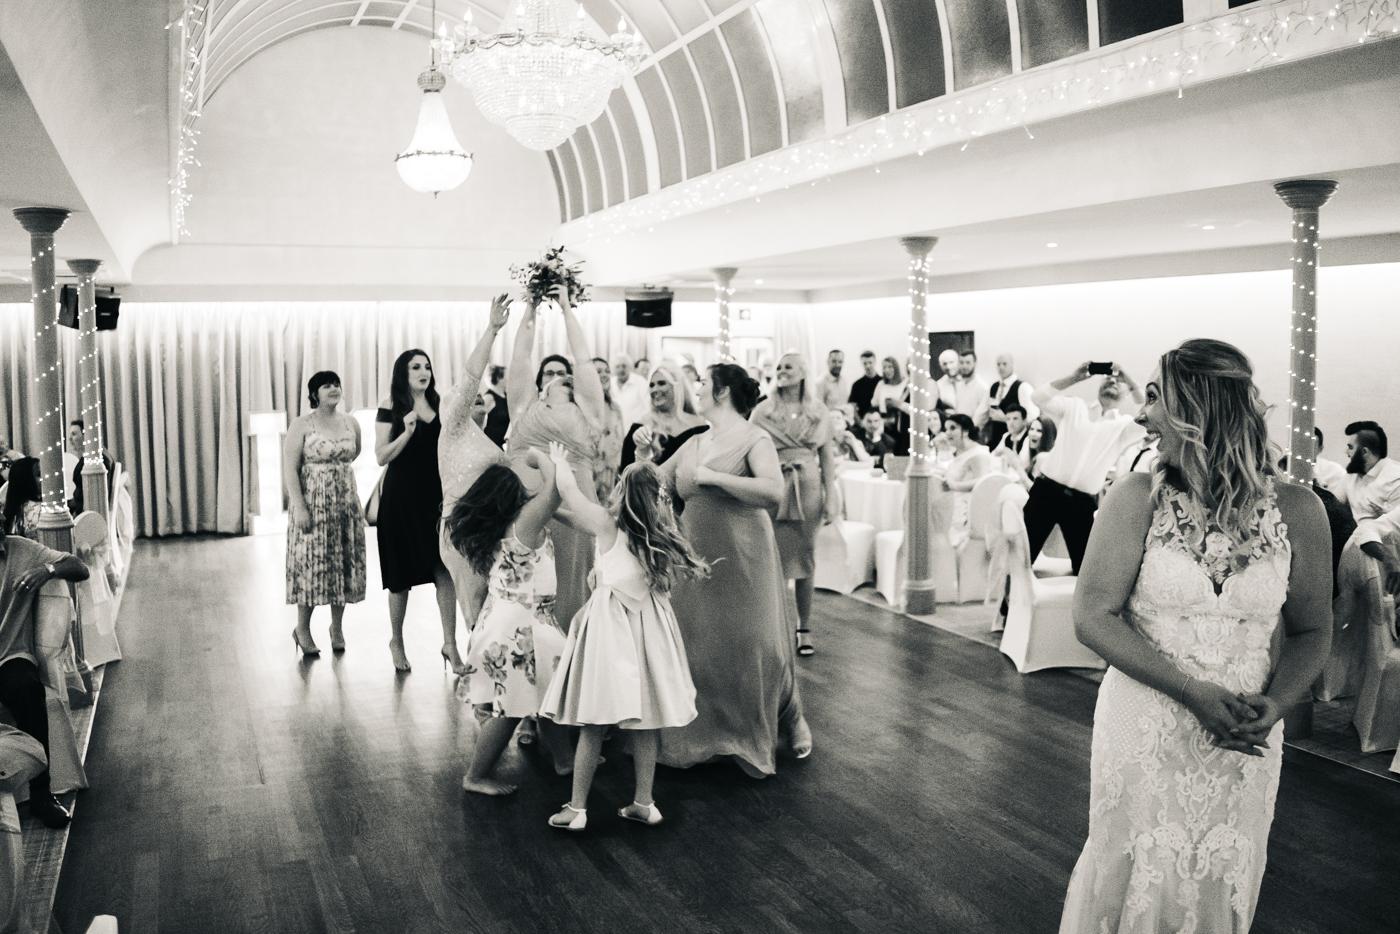 headlame-hall-north-yorkshire-north-east-photographer-wedding-0051.jpg